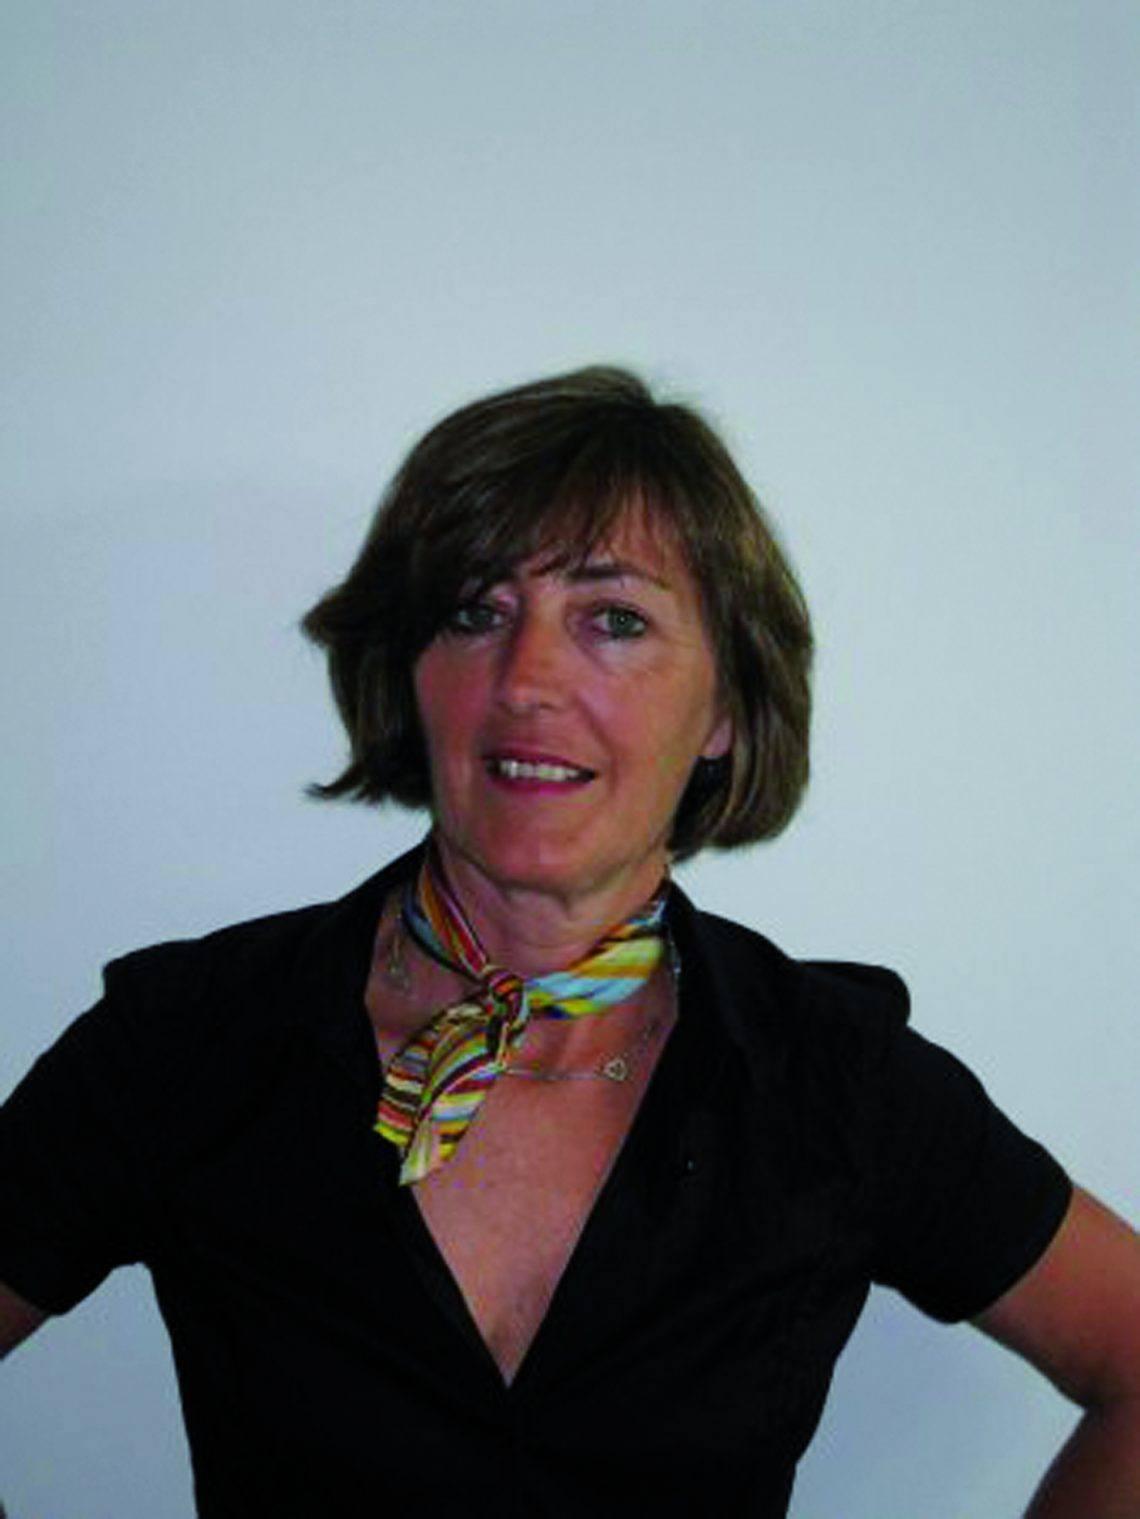 Claire Francoulon